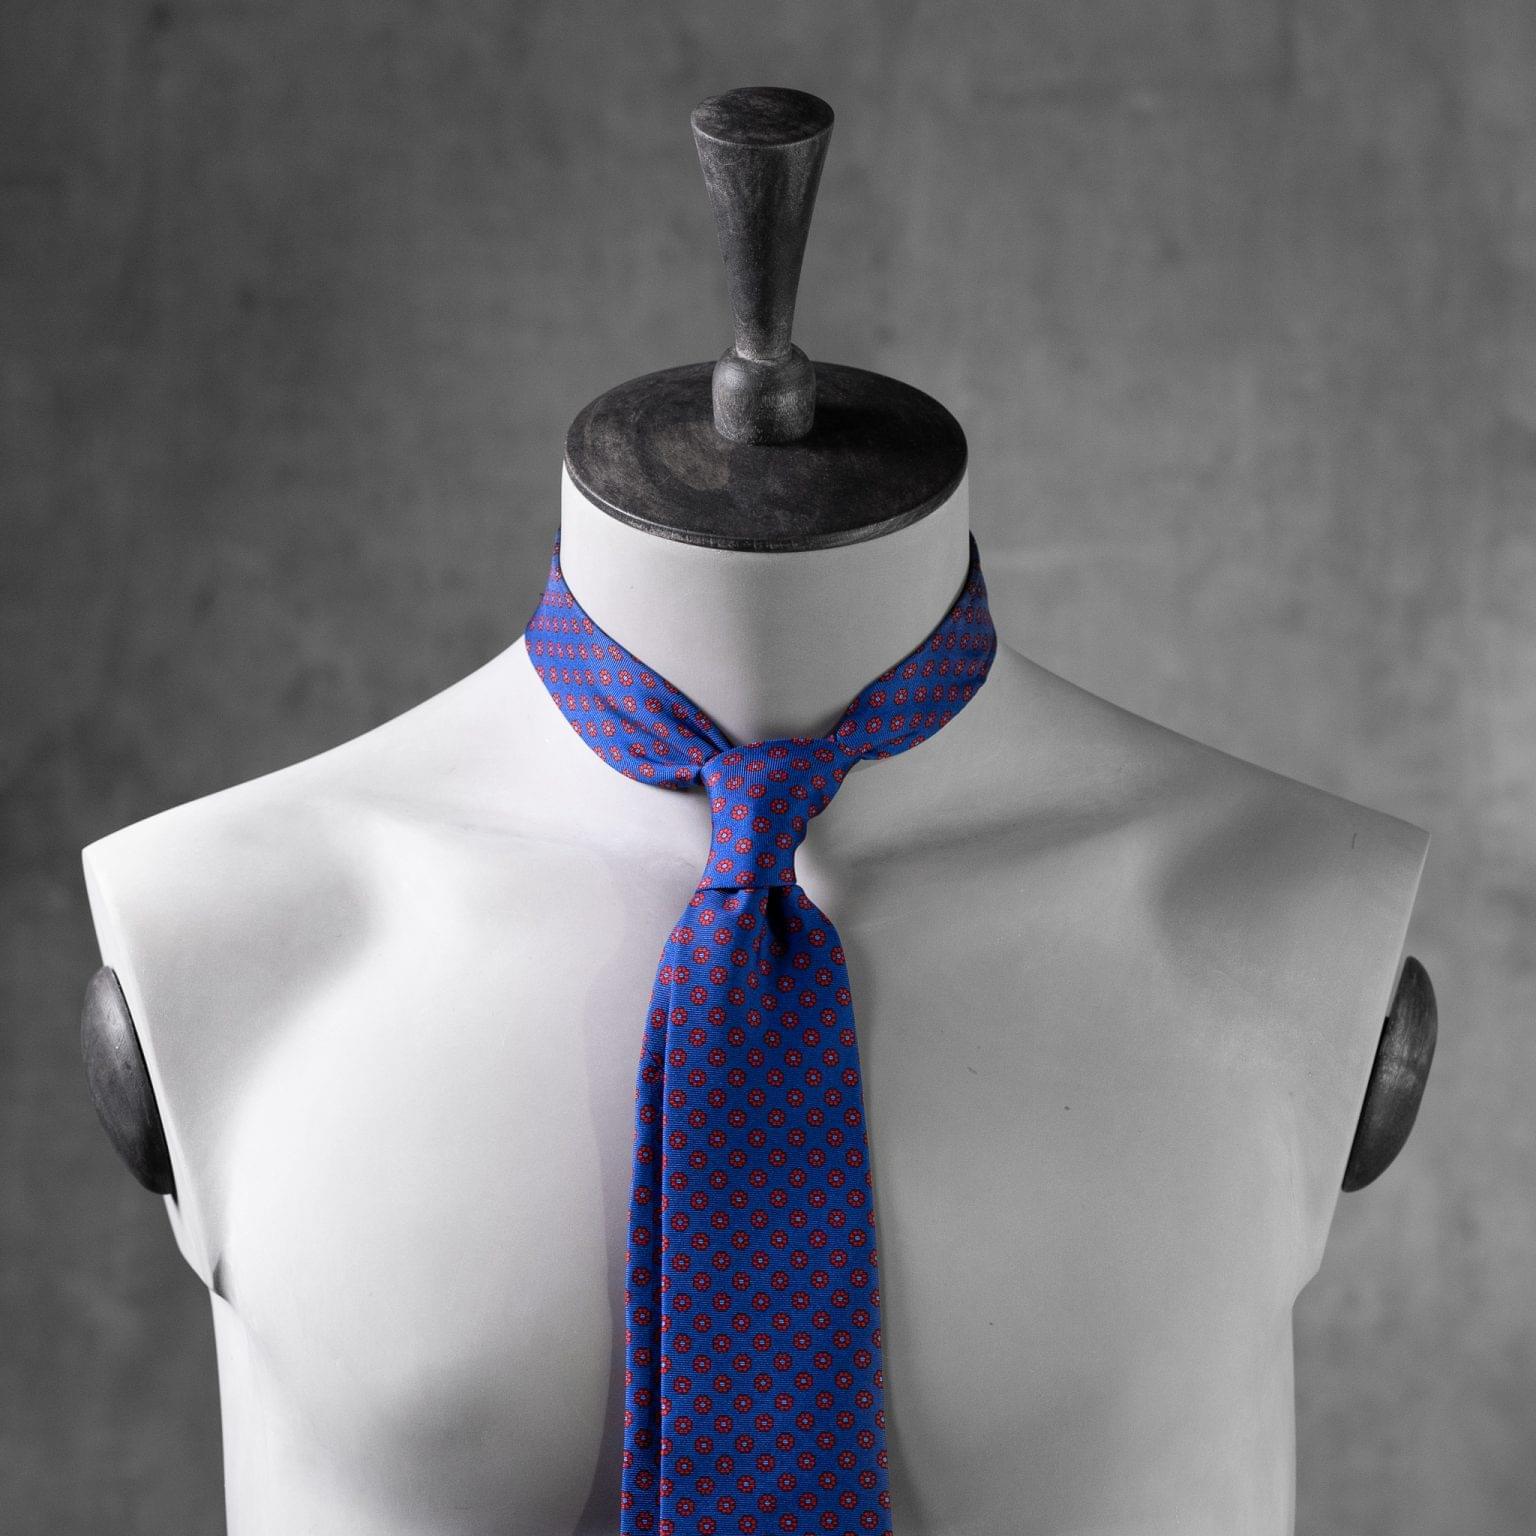 PRINTED-SILK-SEDA-ESTAMPADA-0538-Tie-Initials-Corbata-Iniciales-The-Seelk-3